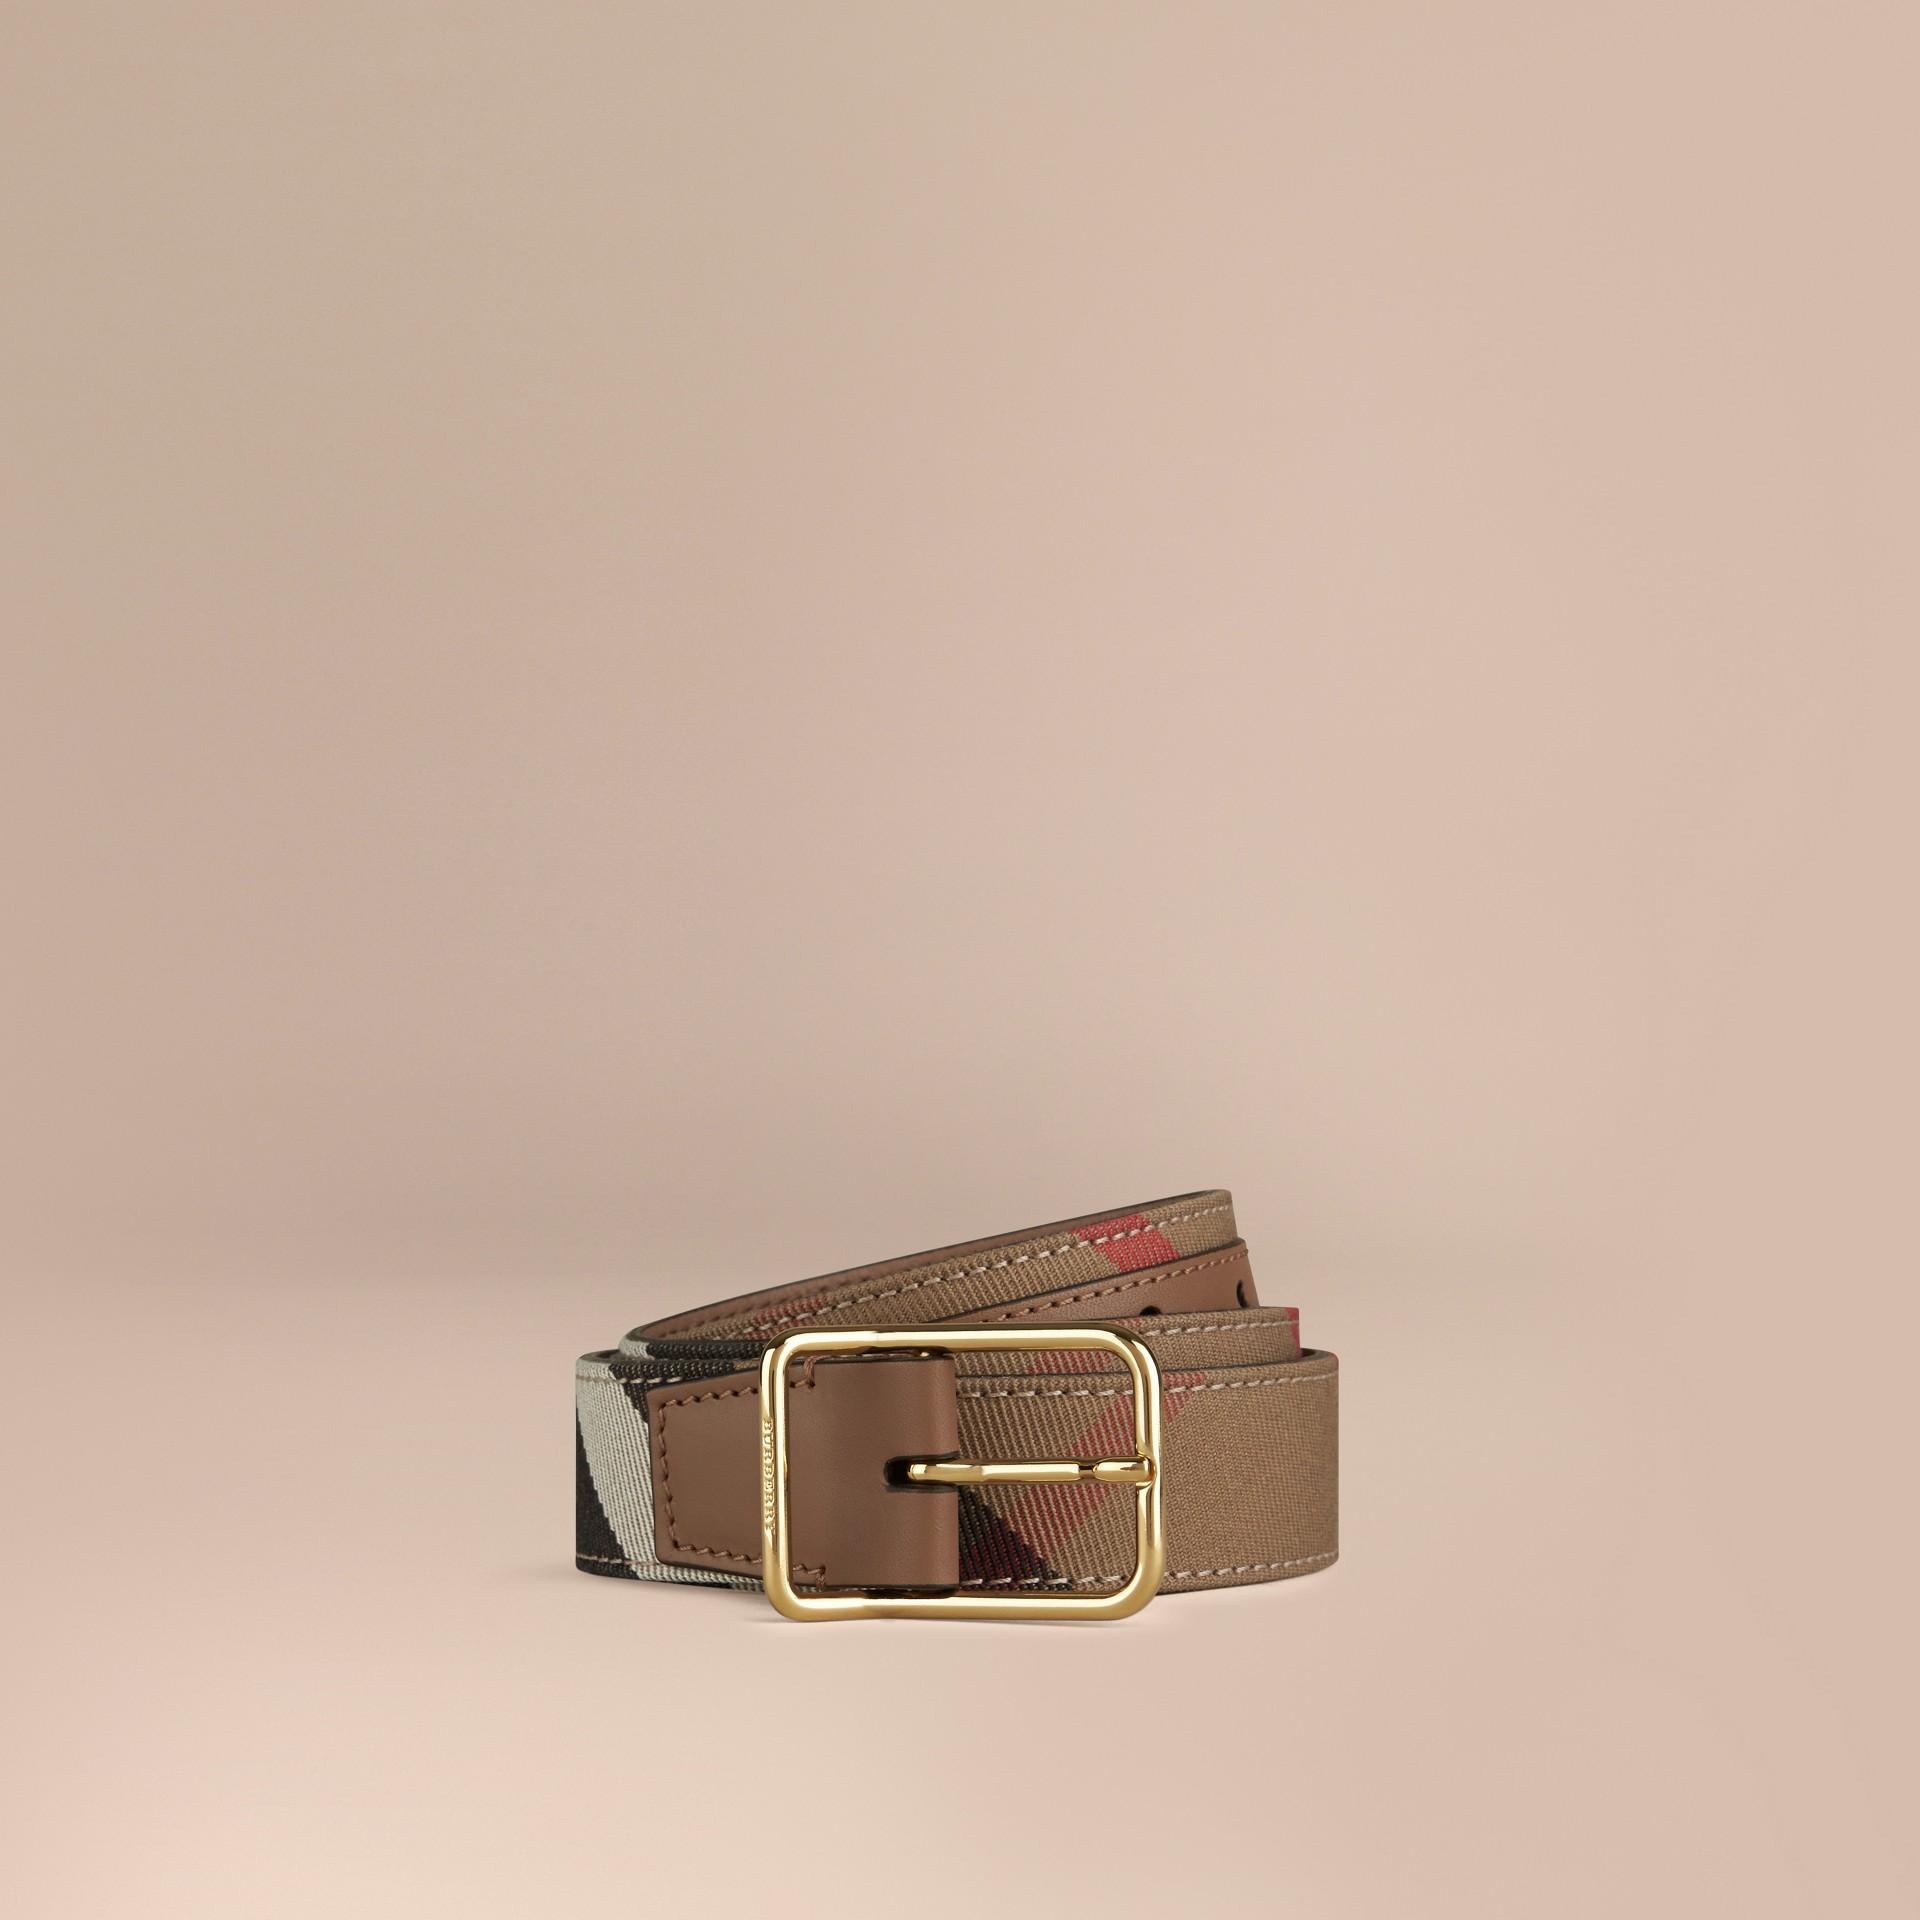 Dunkles sandfarben Gürtel in House Check Dunkles Sandfarben - Galerie-Bild 1